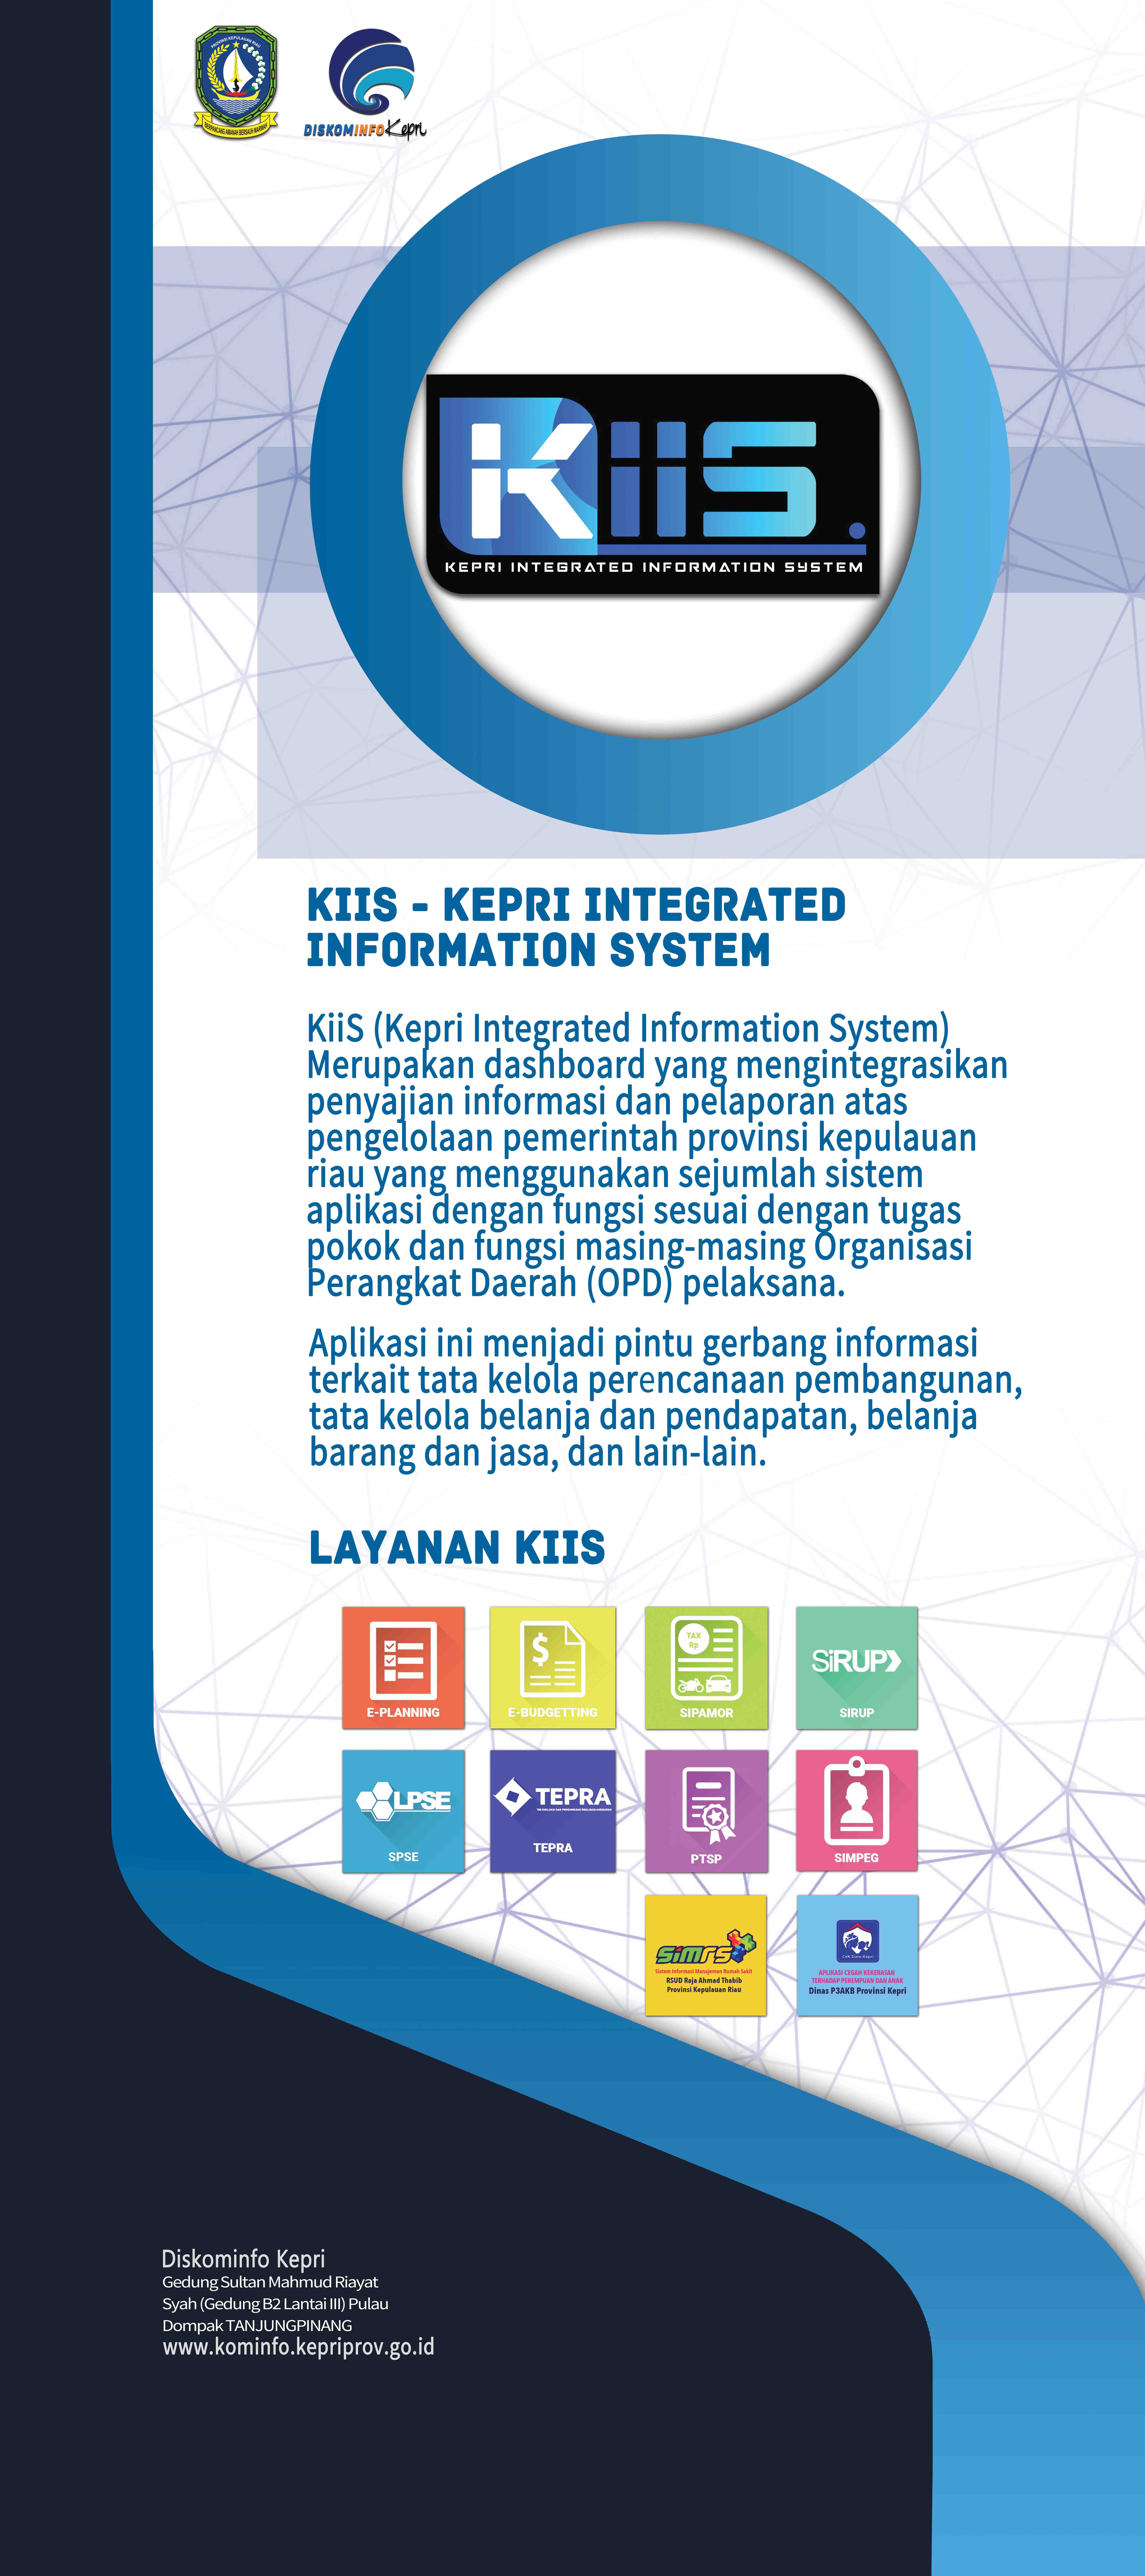 KIIS - Kepri Integrated Information System